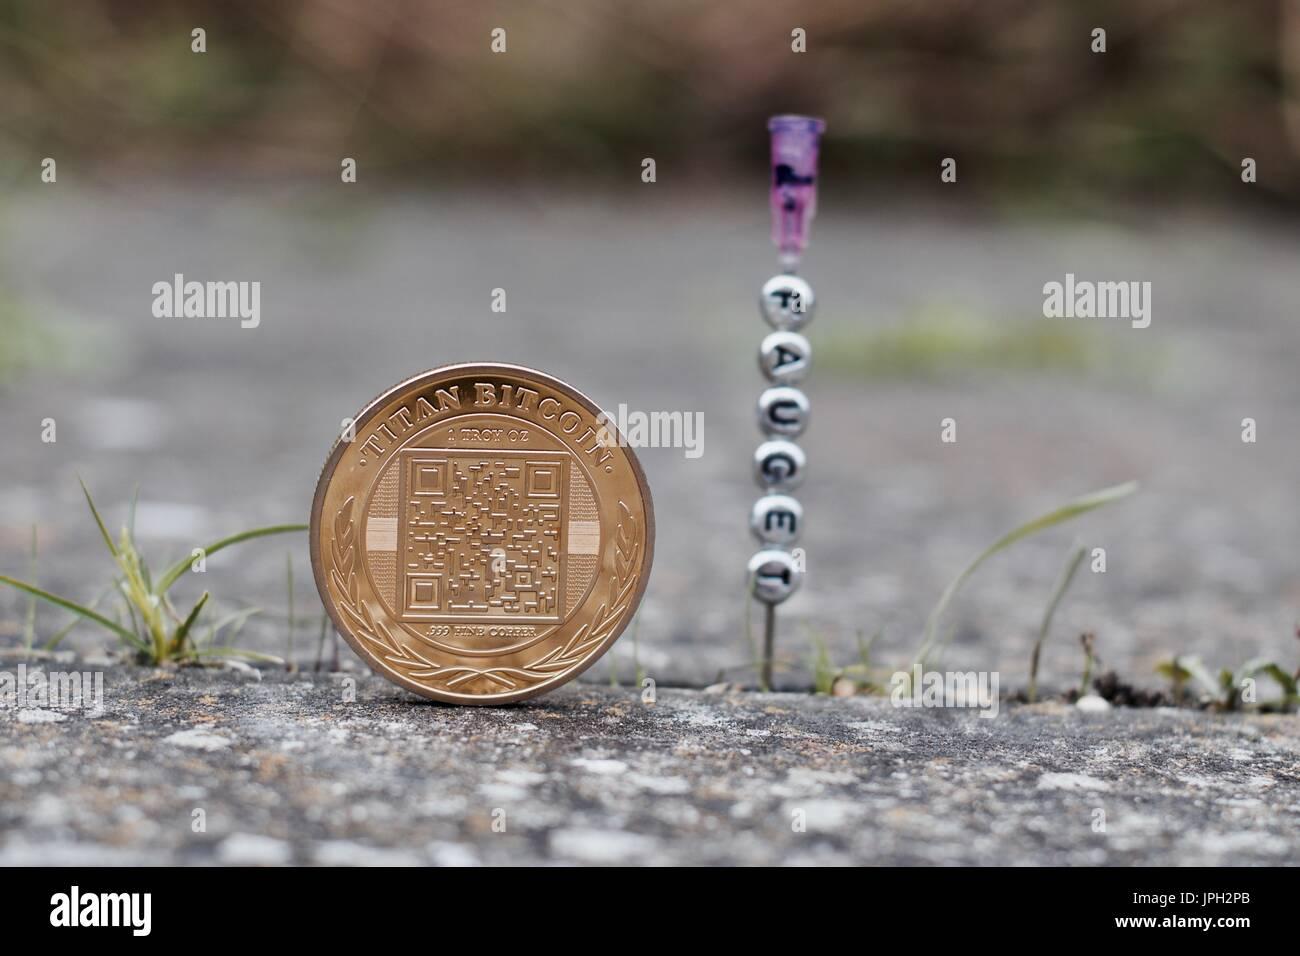 Bitcoin faucet coinpot stock : Bitcoin mining rig in pakistan day